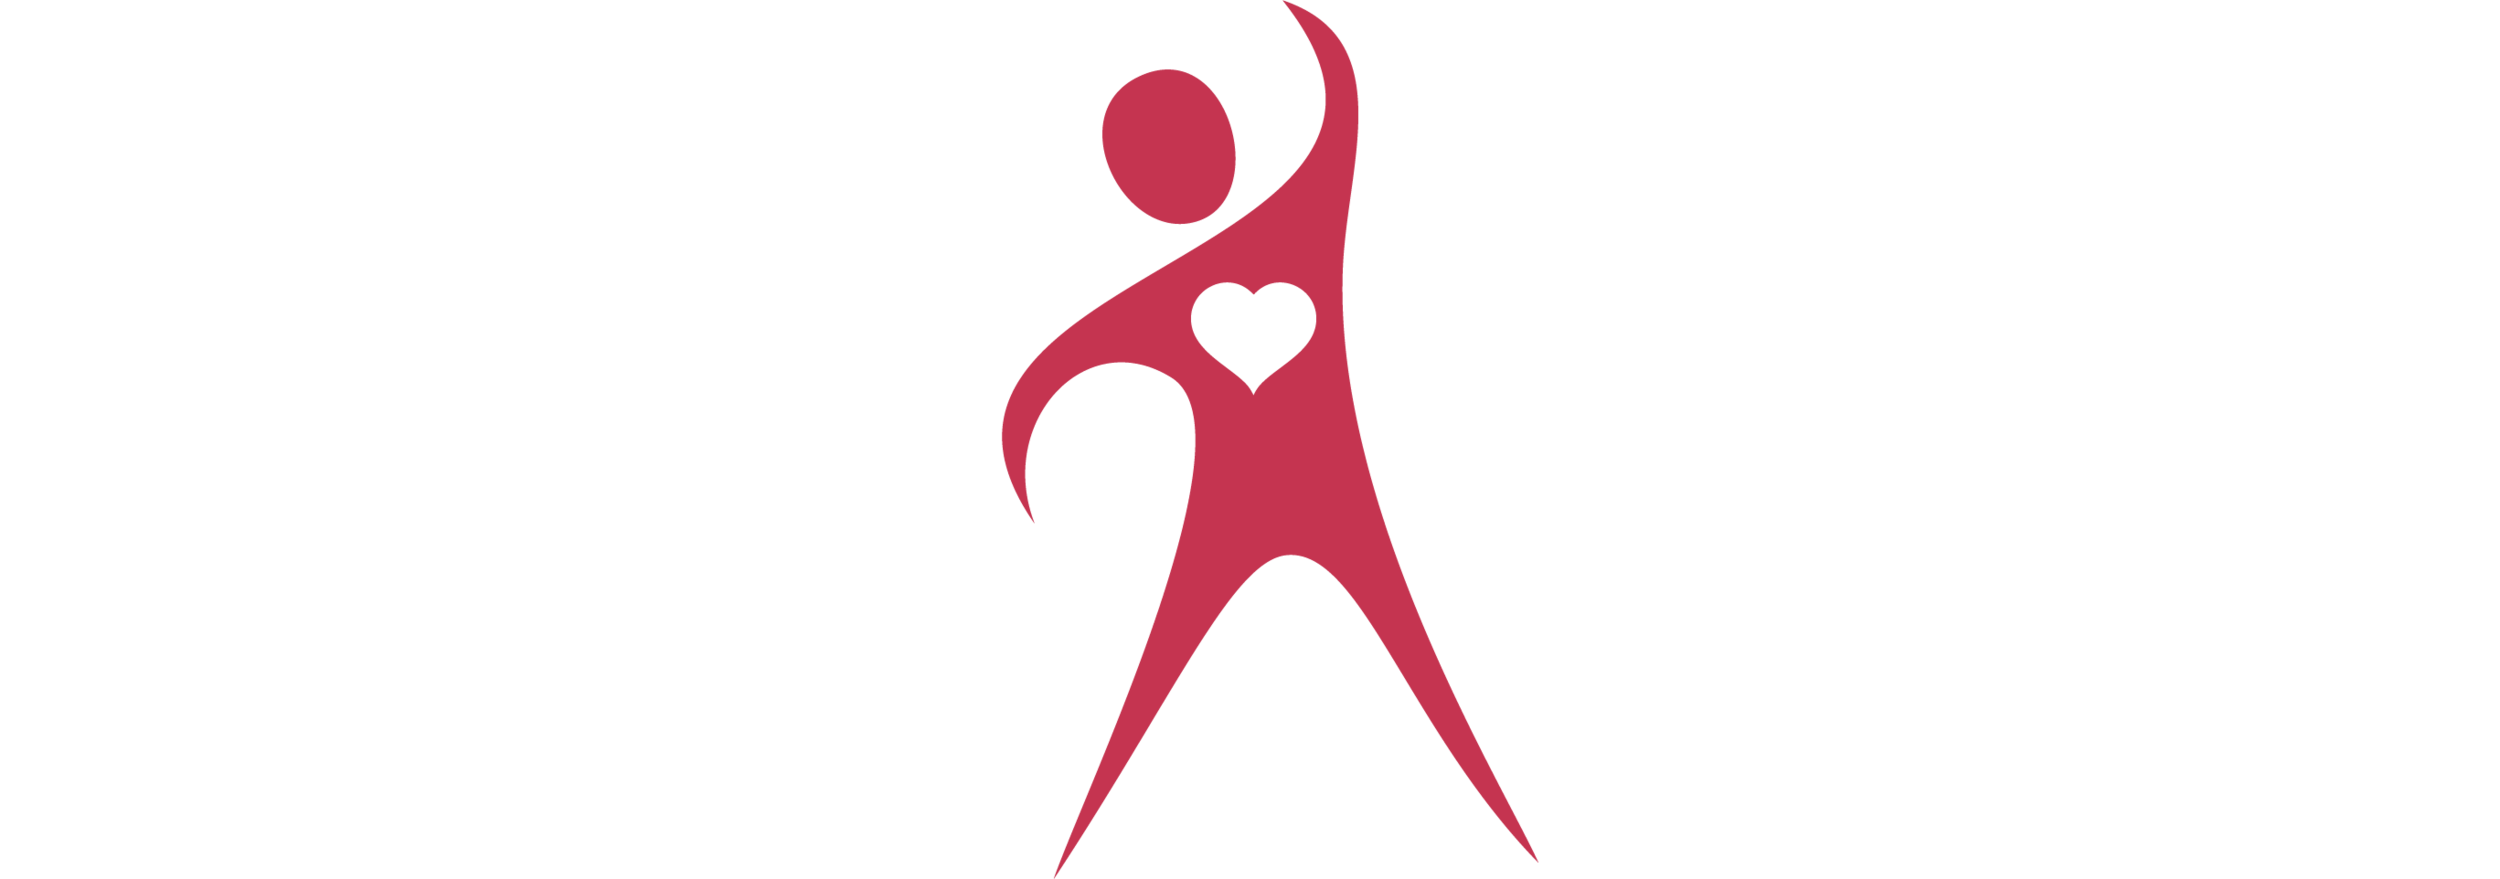 Racing Hearts logo V2 (WHITE TEXT).png